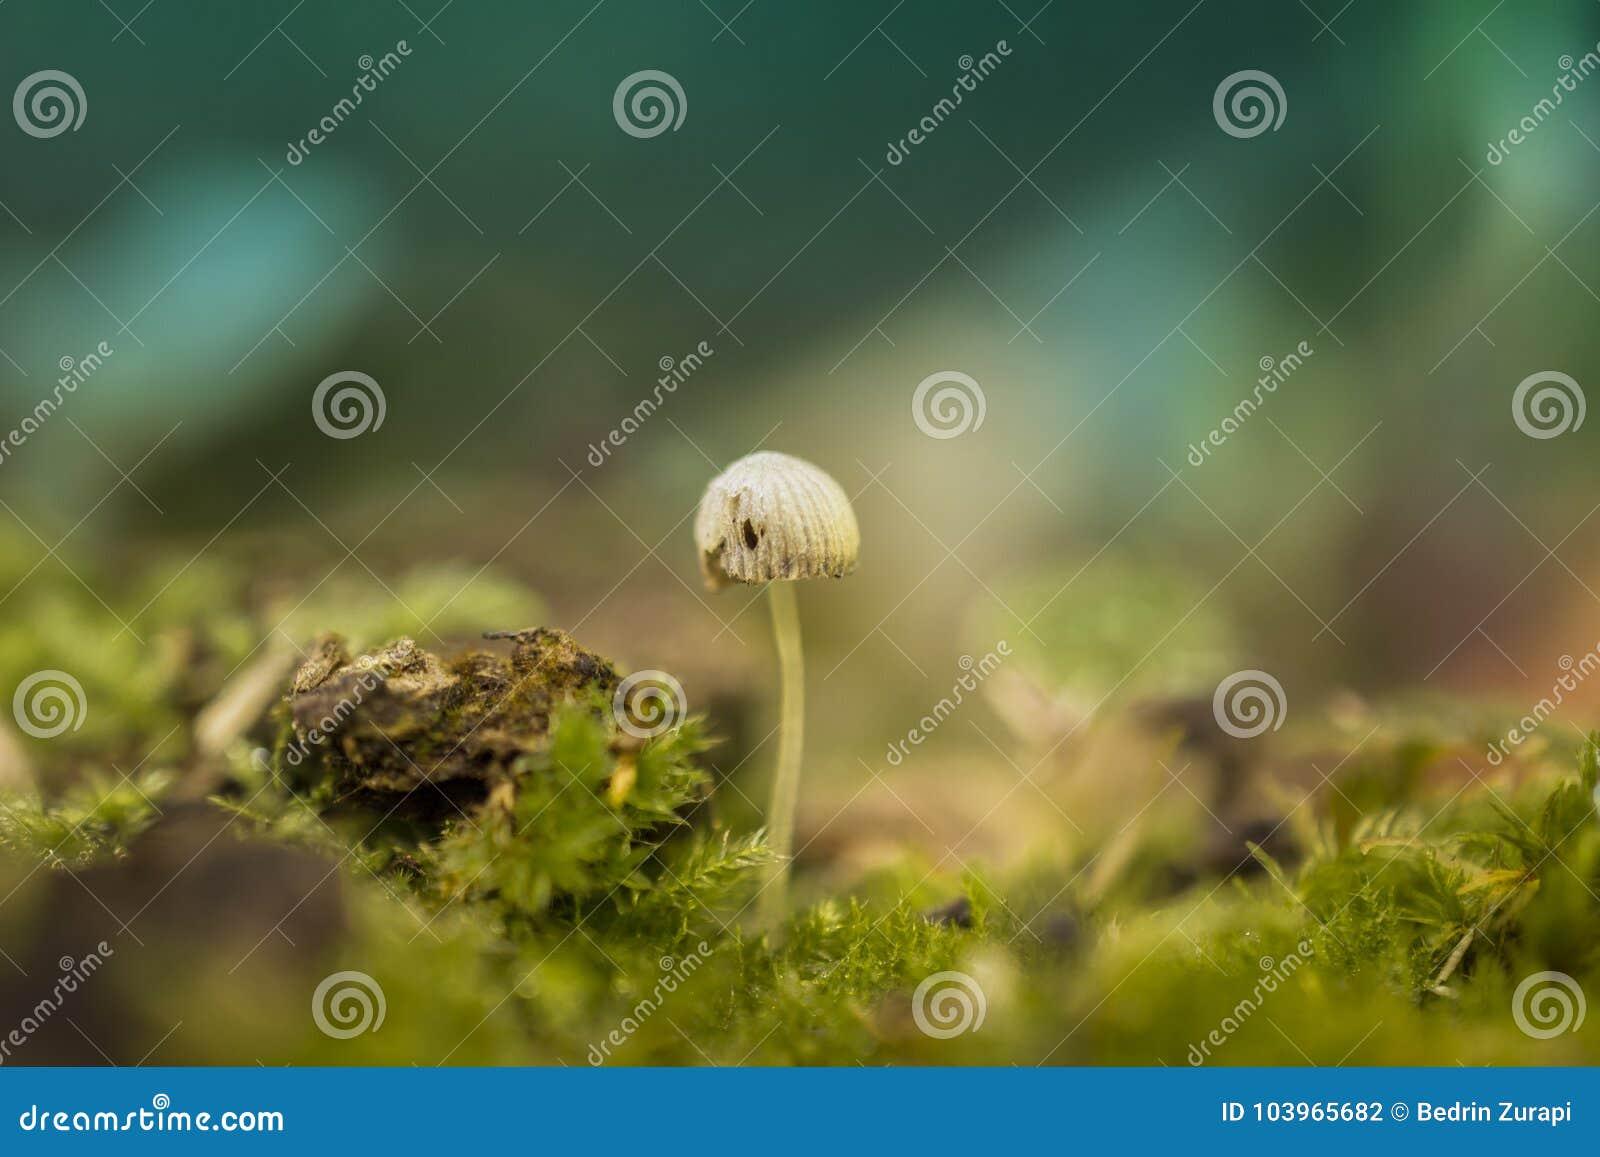 Mushroom fungi small light sweet